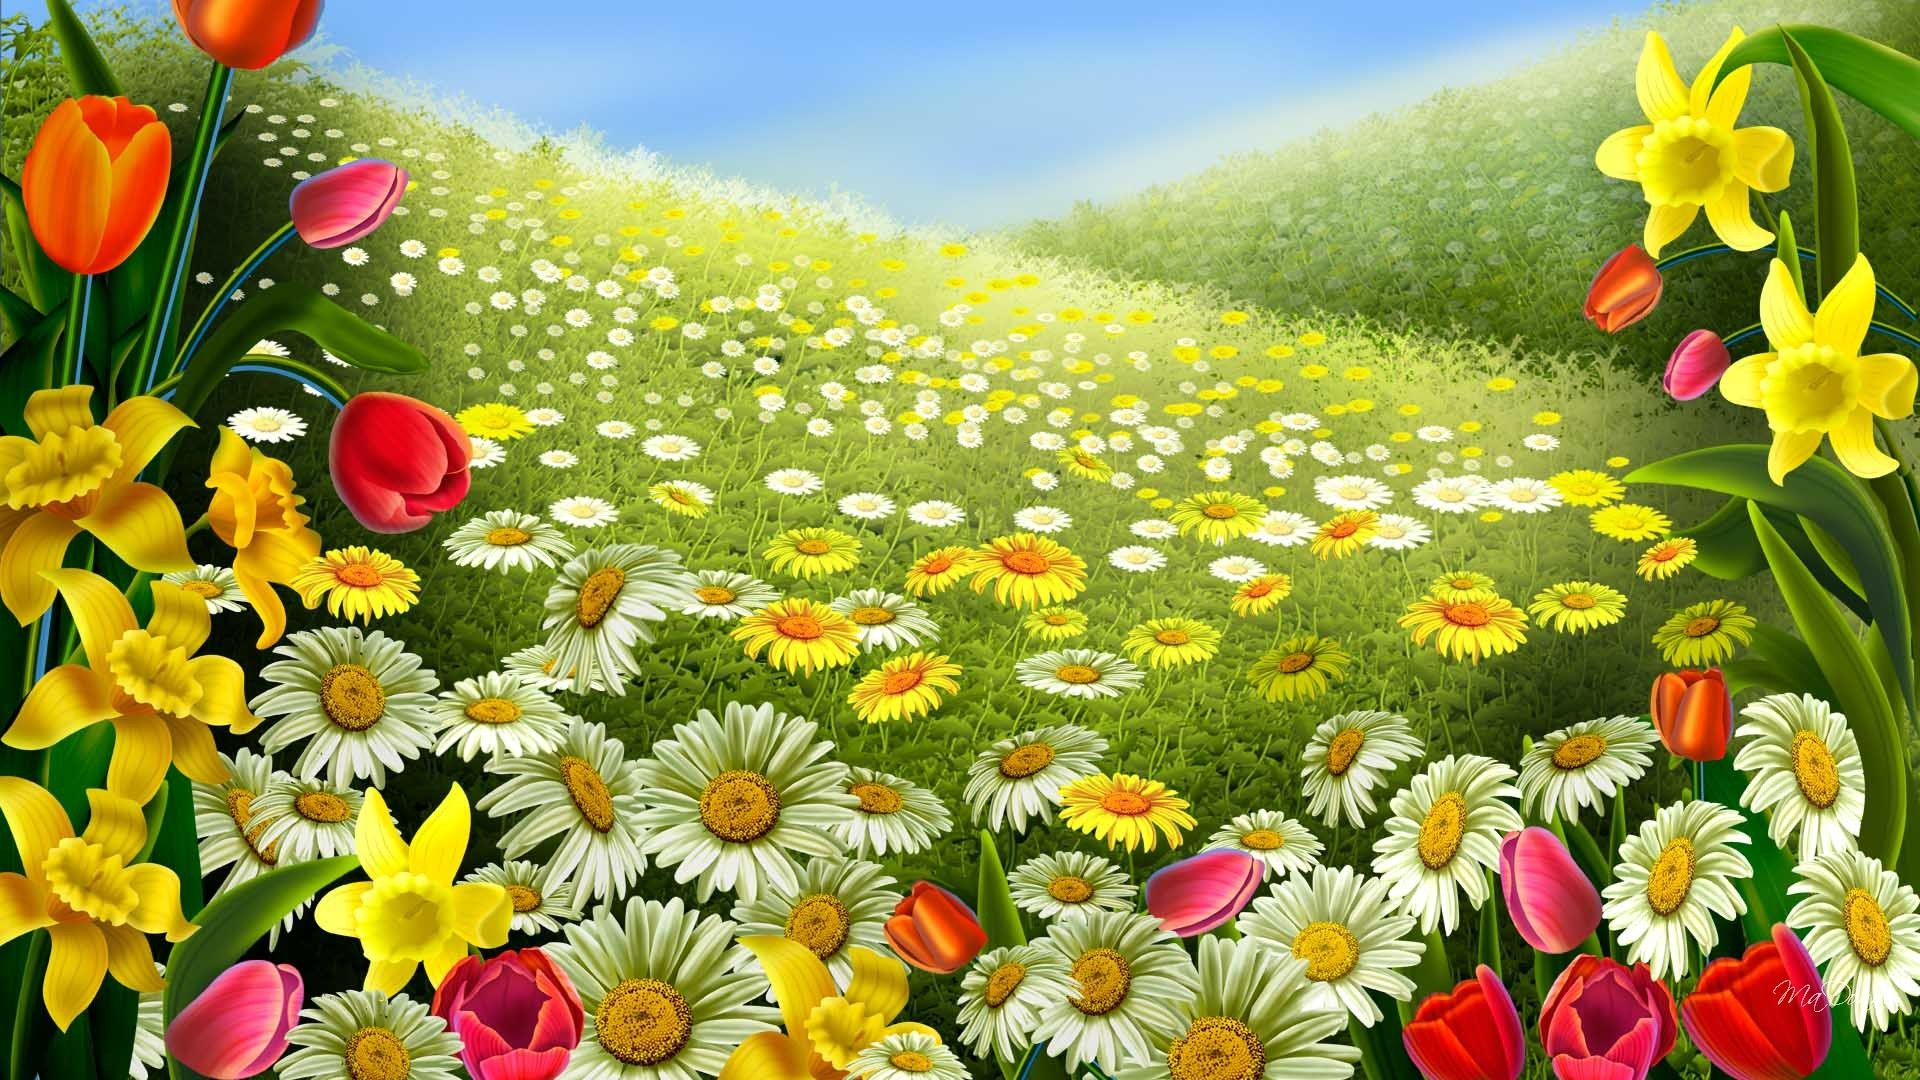 Beautiful Flower Wallpapers 19201080 Spring Wallpaper Beautiful Flowers Images Spring Wallpaper Hd